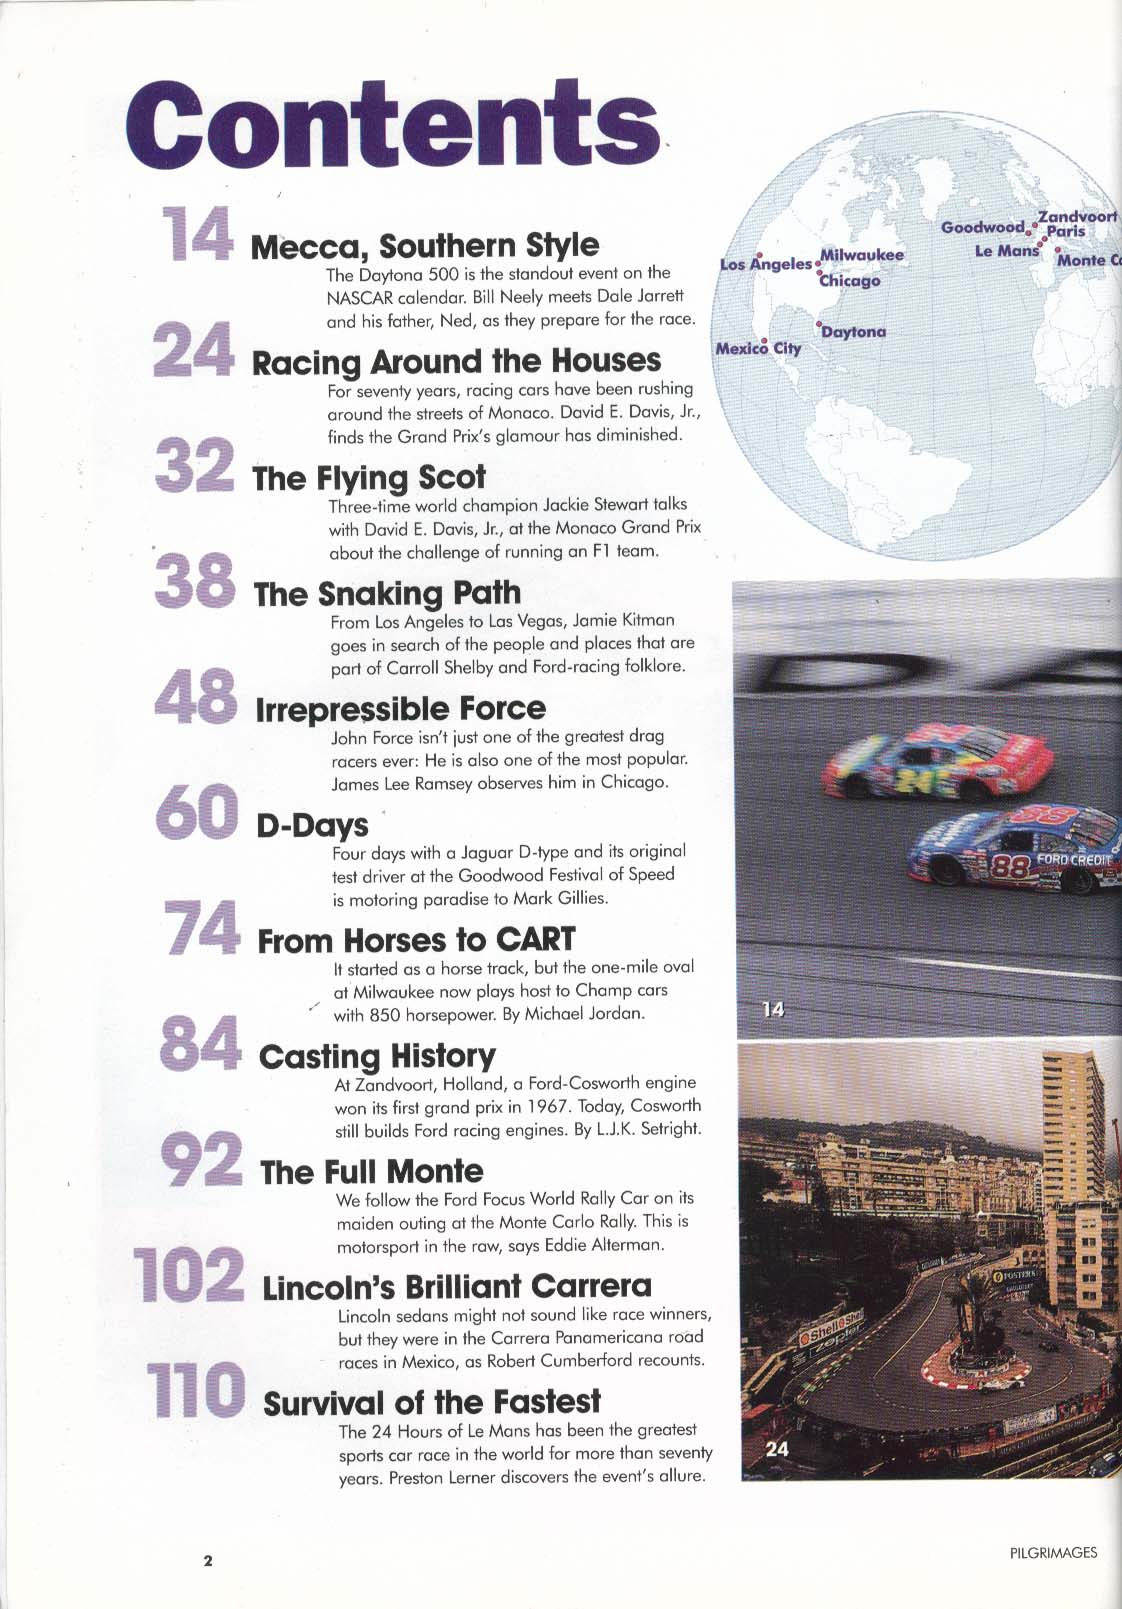 Image for FORD PILGRIMAGES Magazine Supplement Daytona Le Mans Gran Prix Monte Carlo 1999